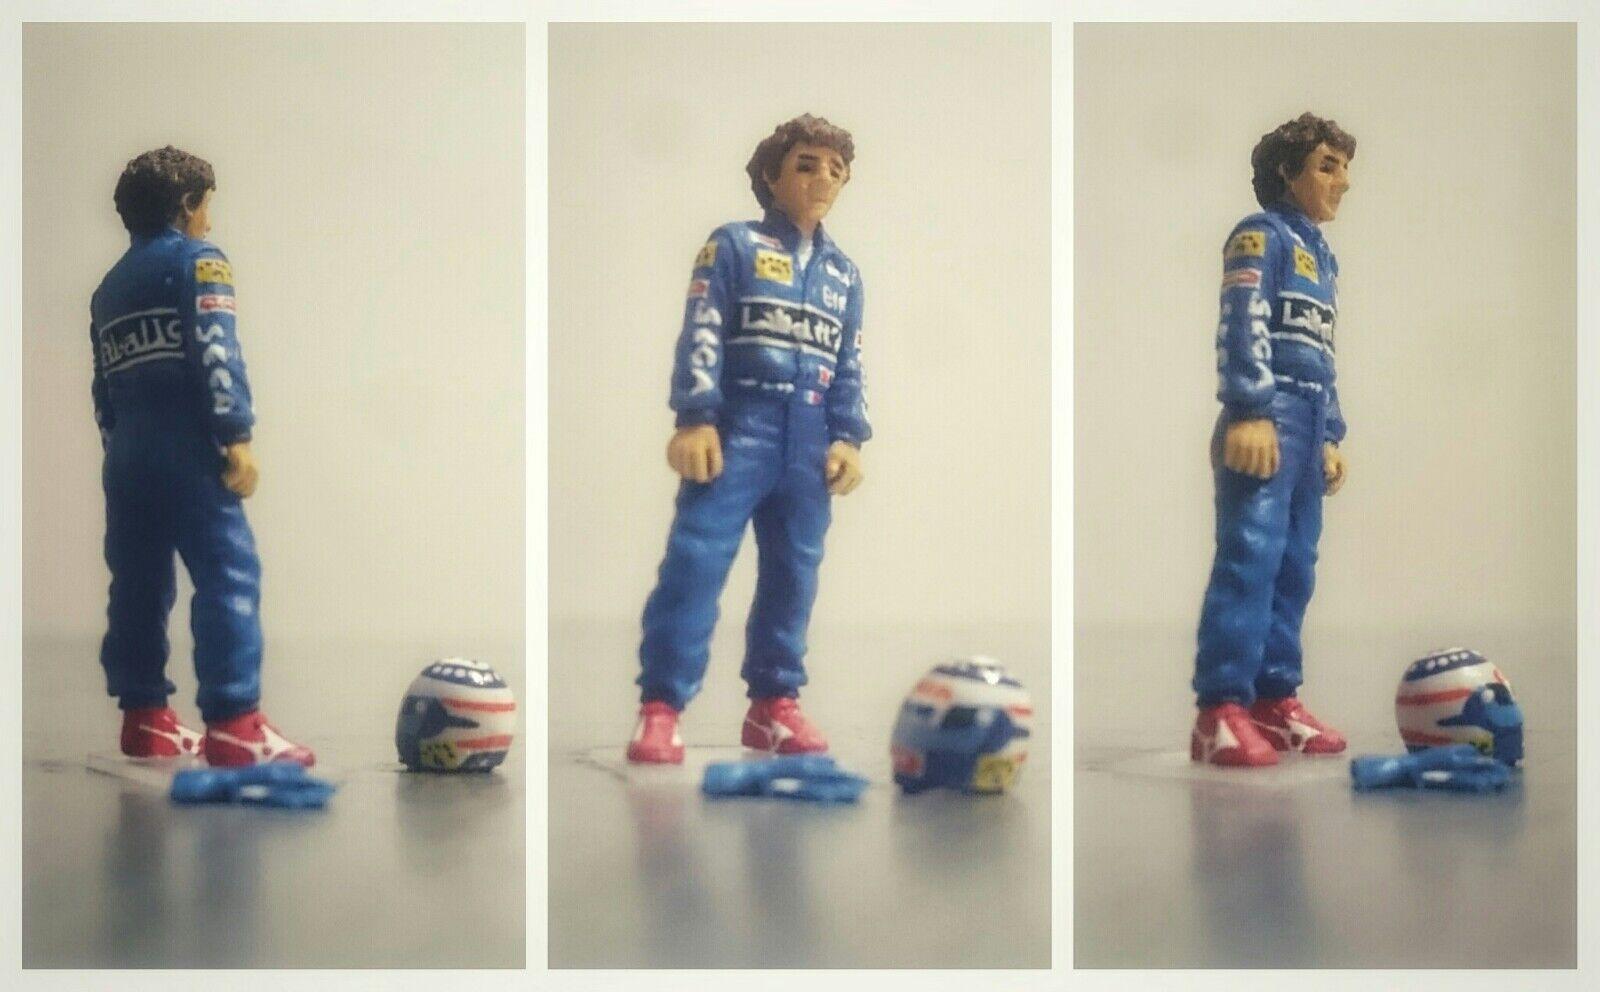 Alain PROST Williams Renault 1993 figurine pilote diorama 1/43 F1 driver figure